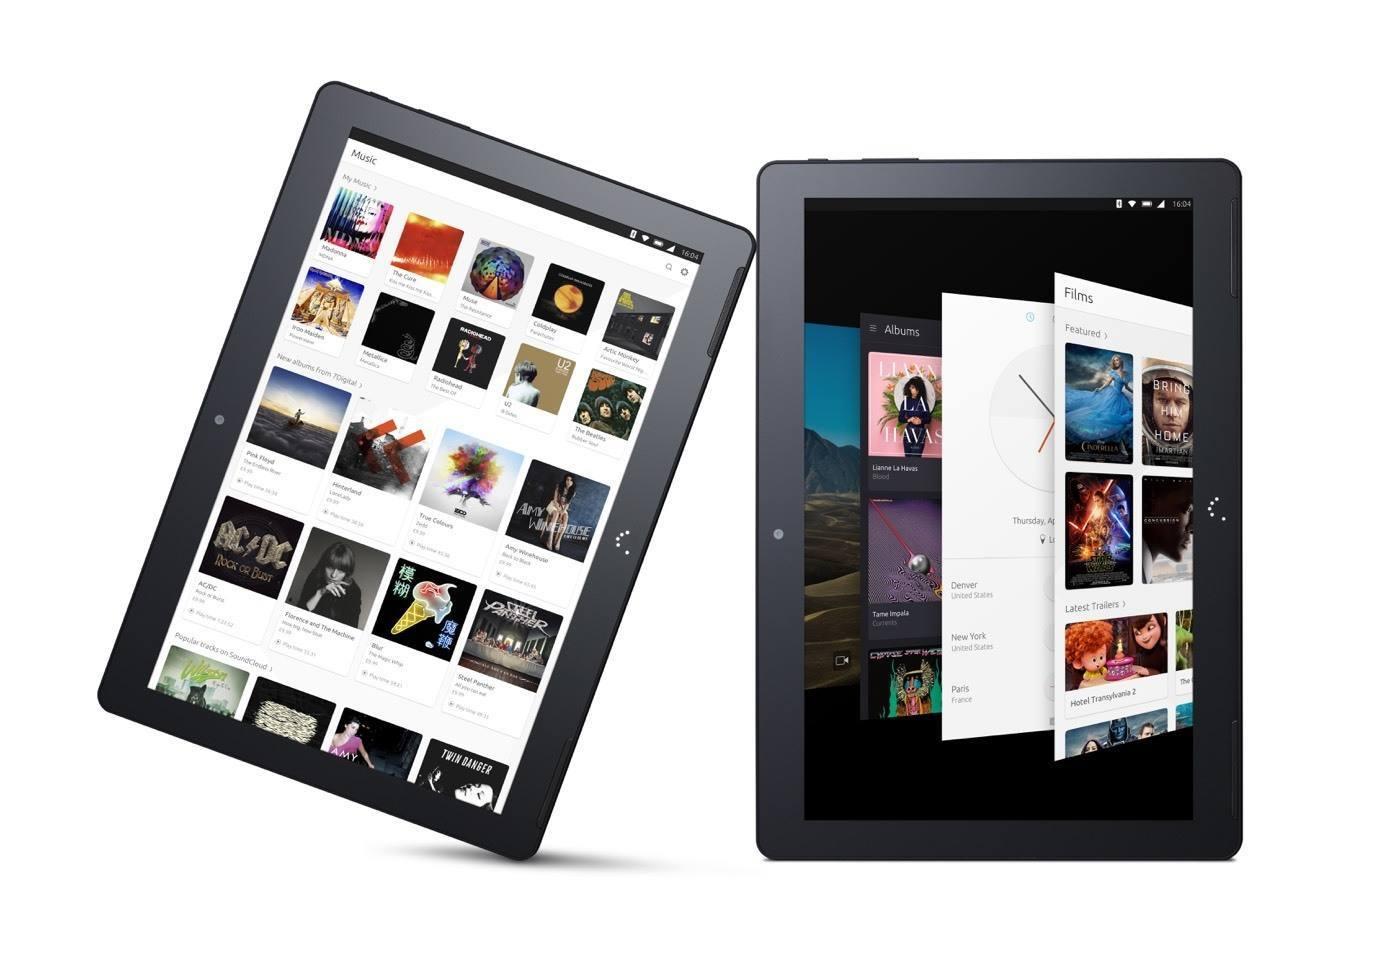 ubuntu-m10-tablet-040216-1